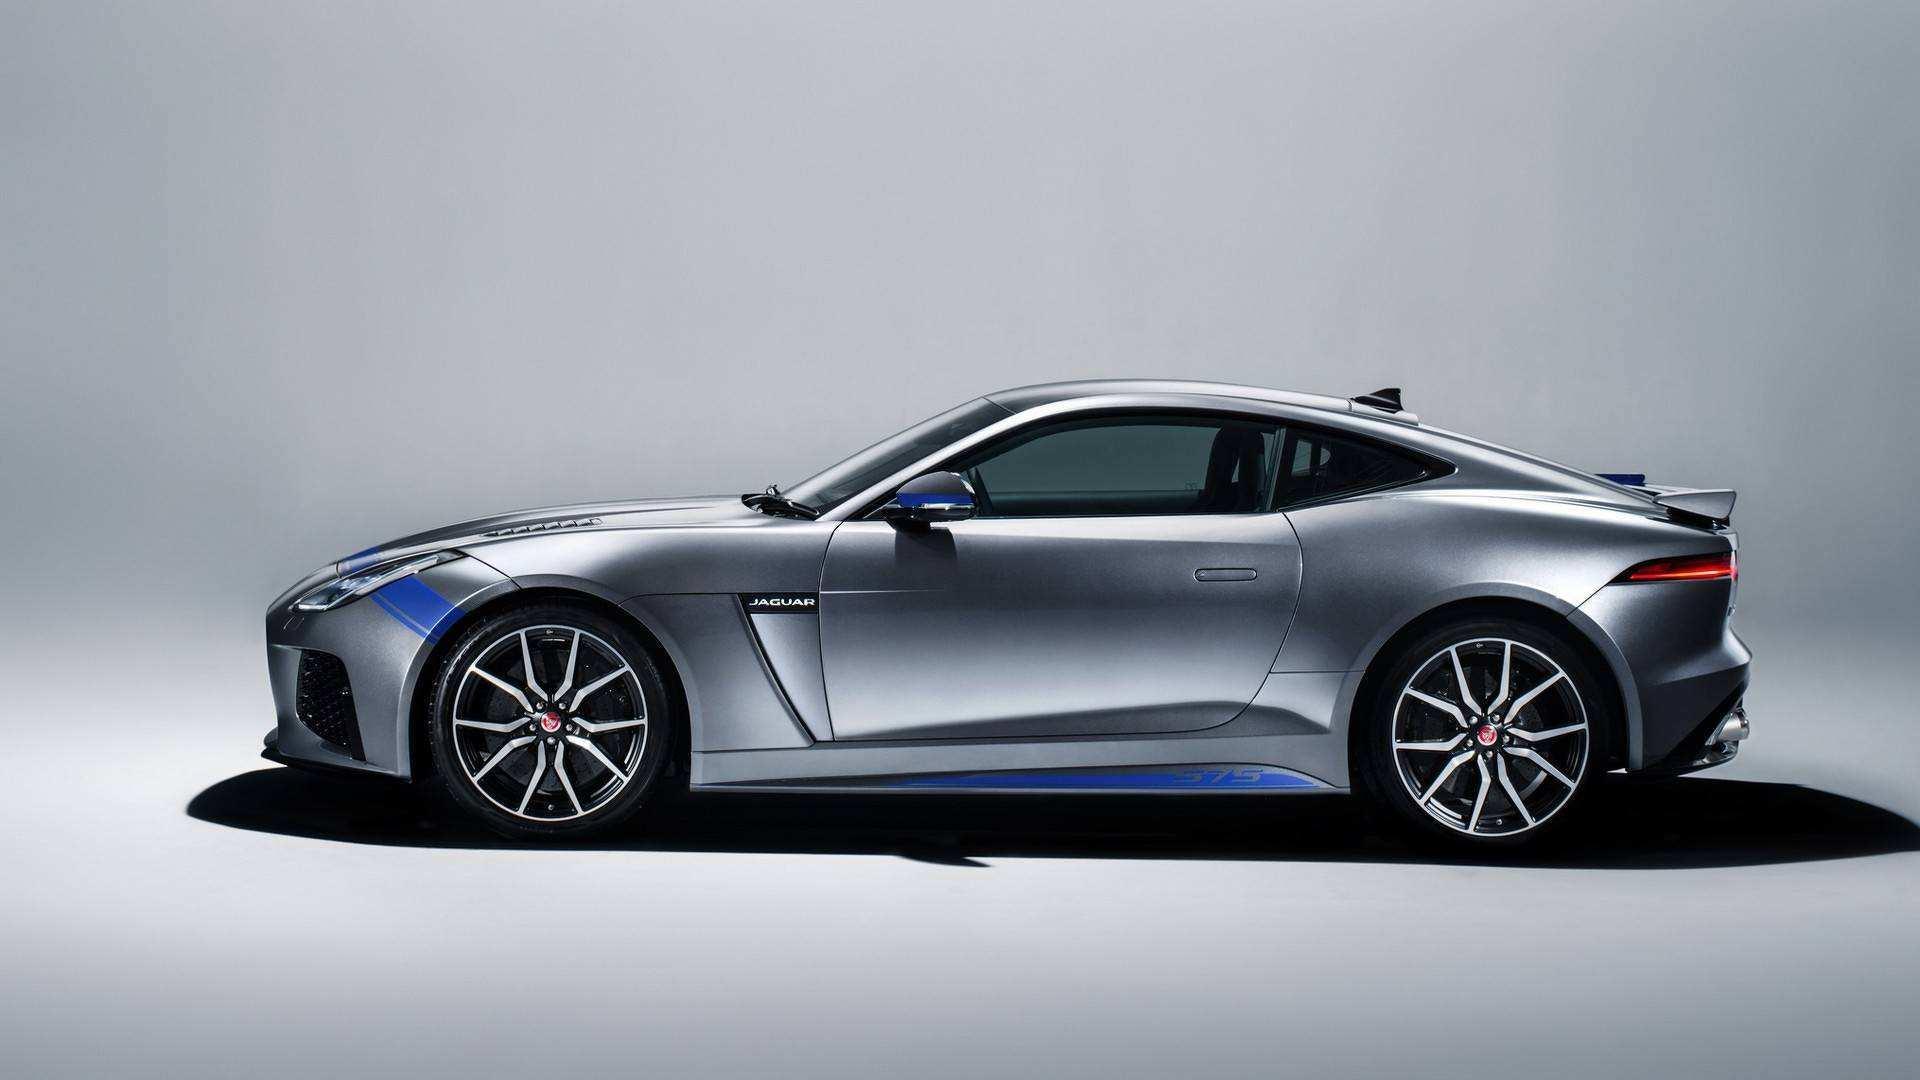 59 All New 2020 Jaguar F Type First Drive by 2020 Jaguar F Type